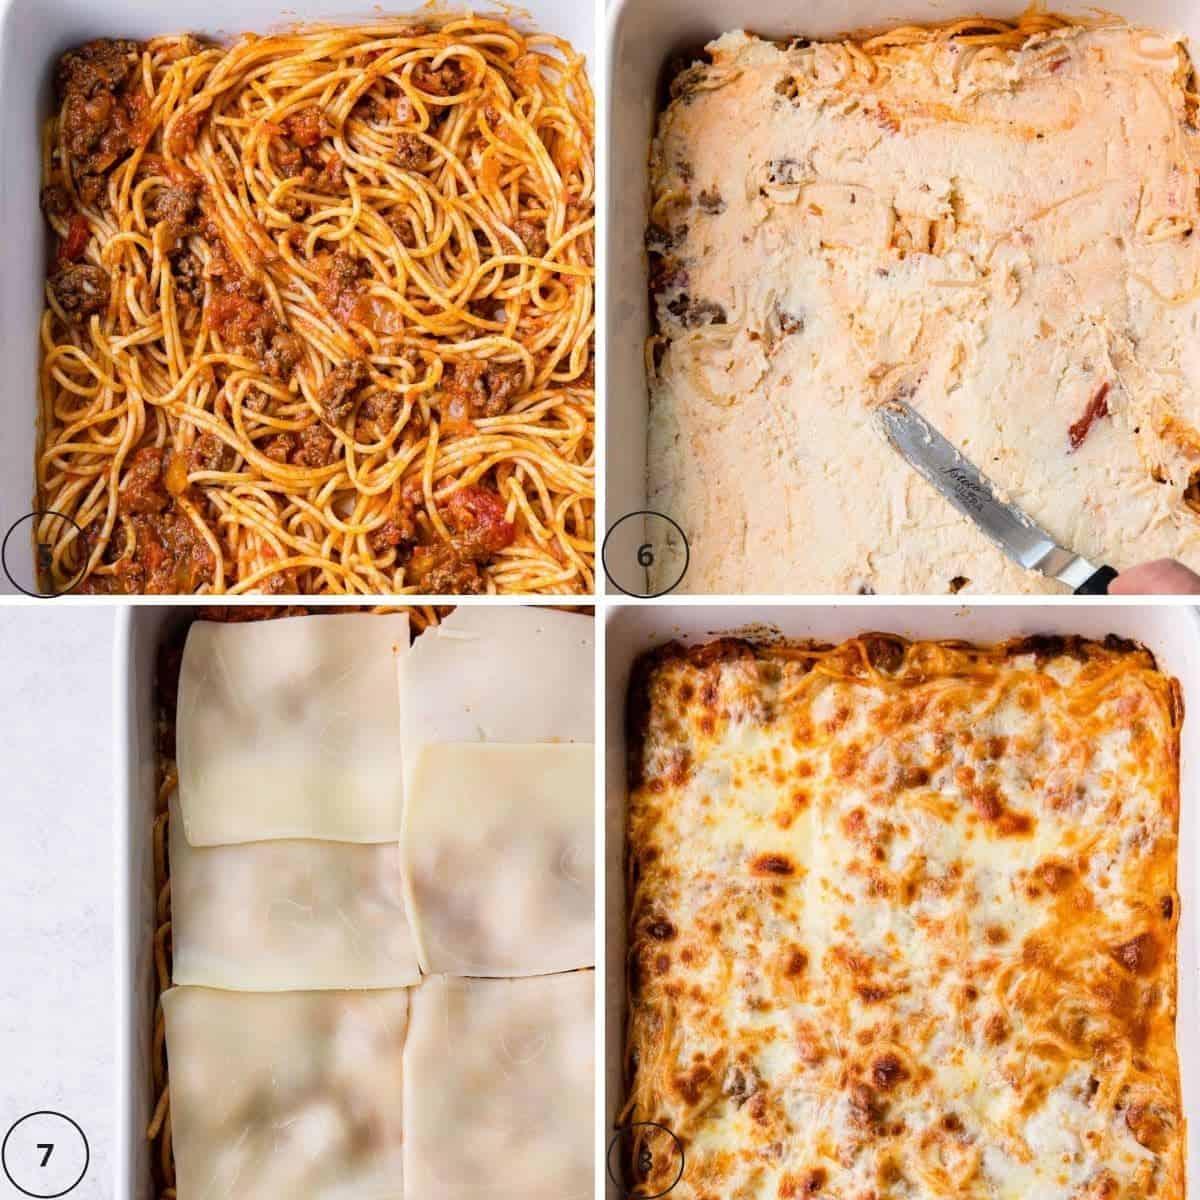 Making spaghetti in a casserole dish.